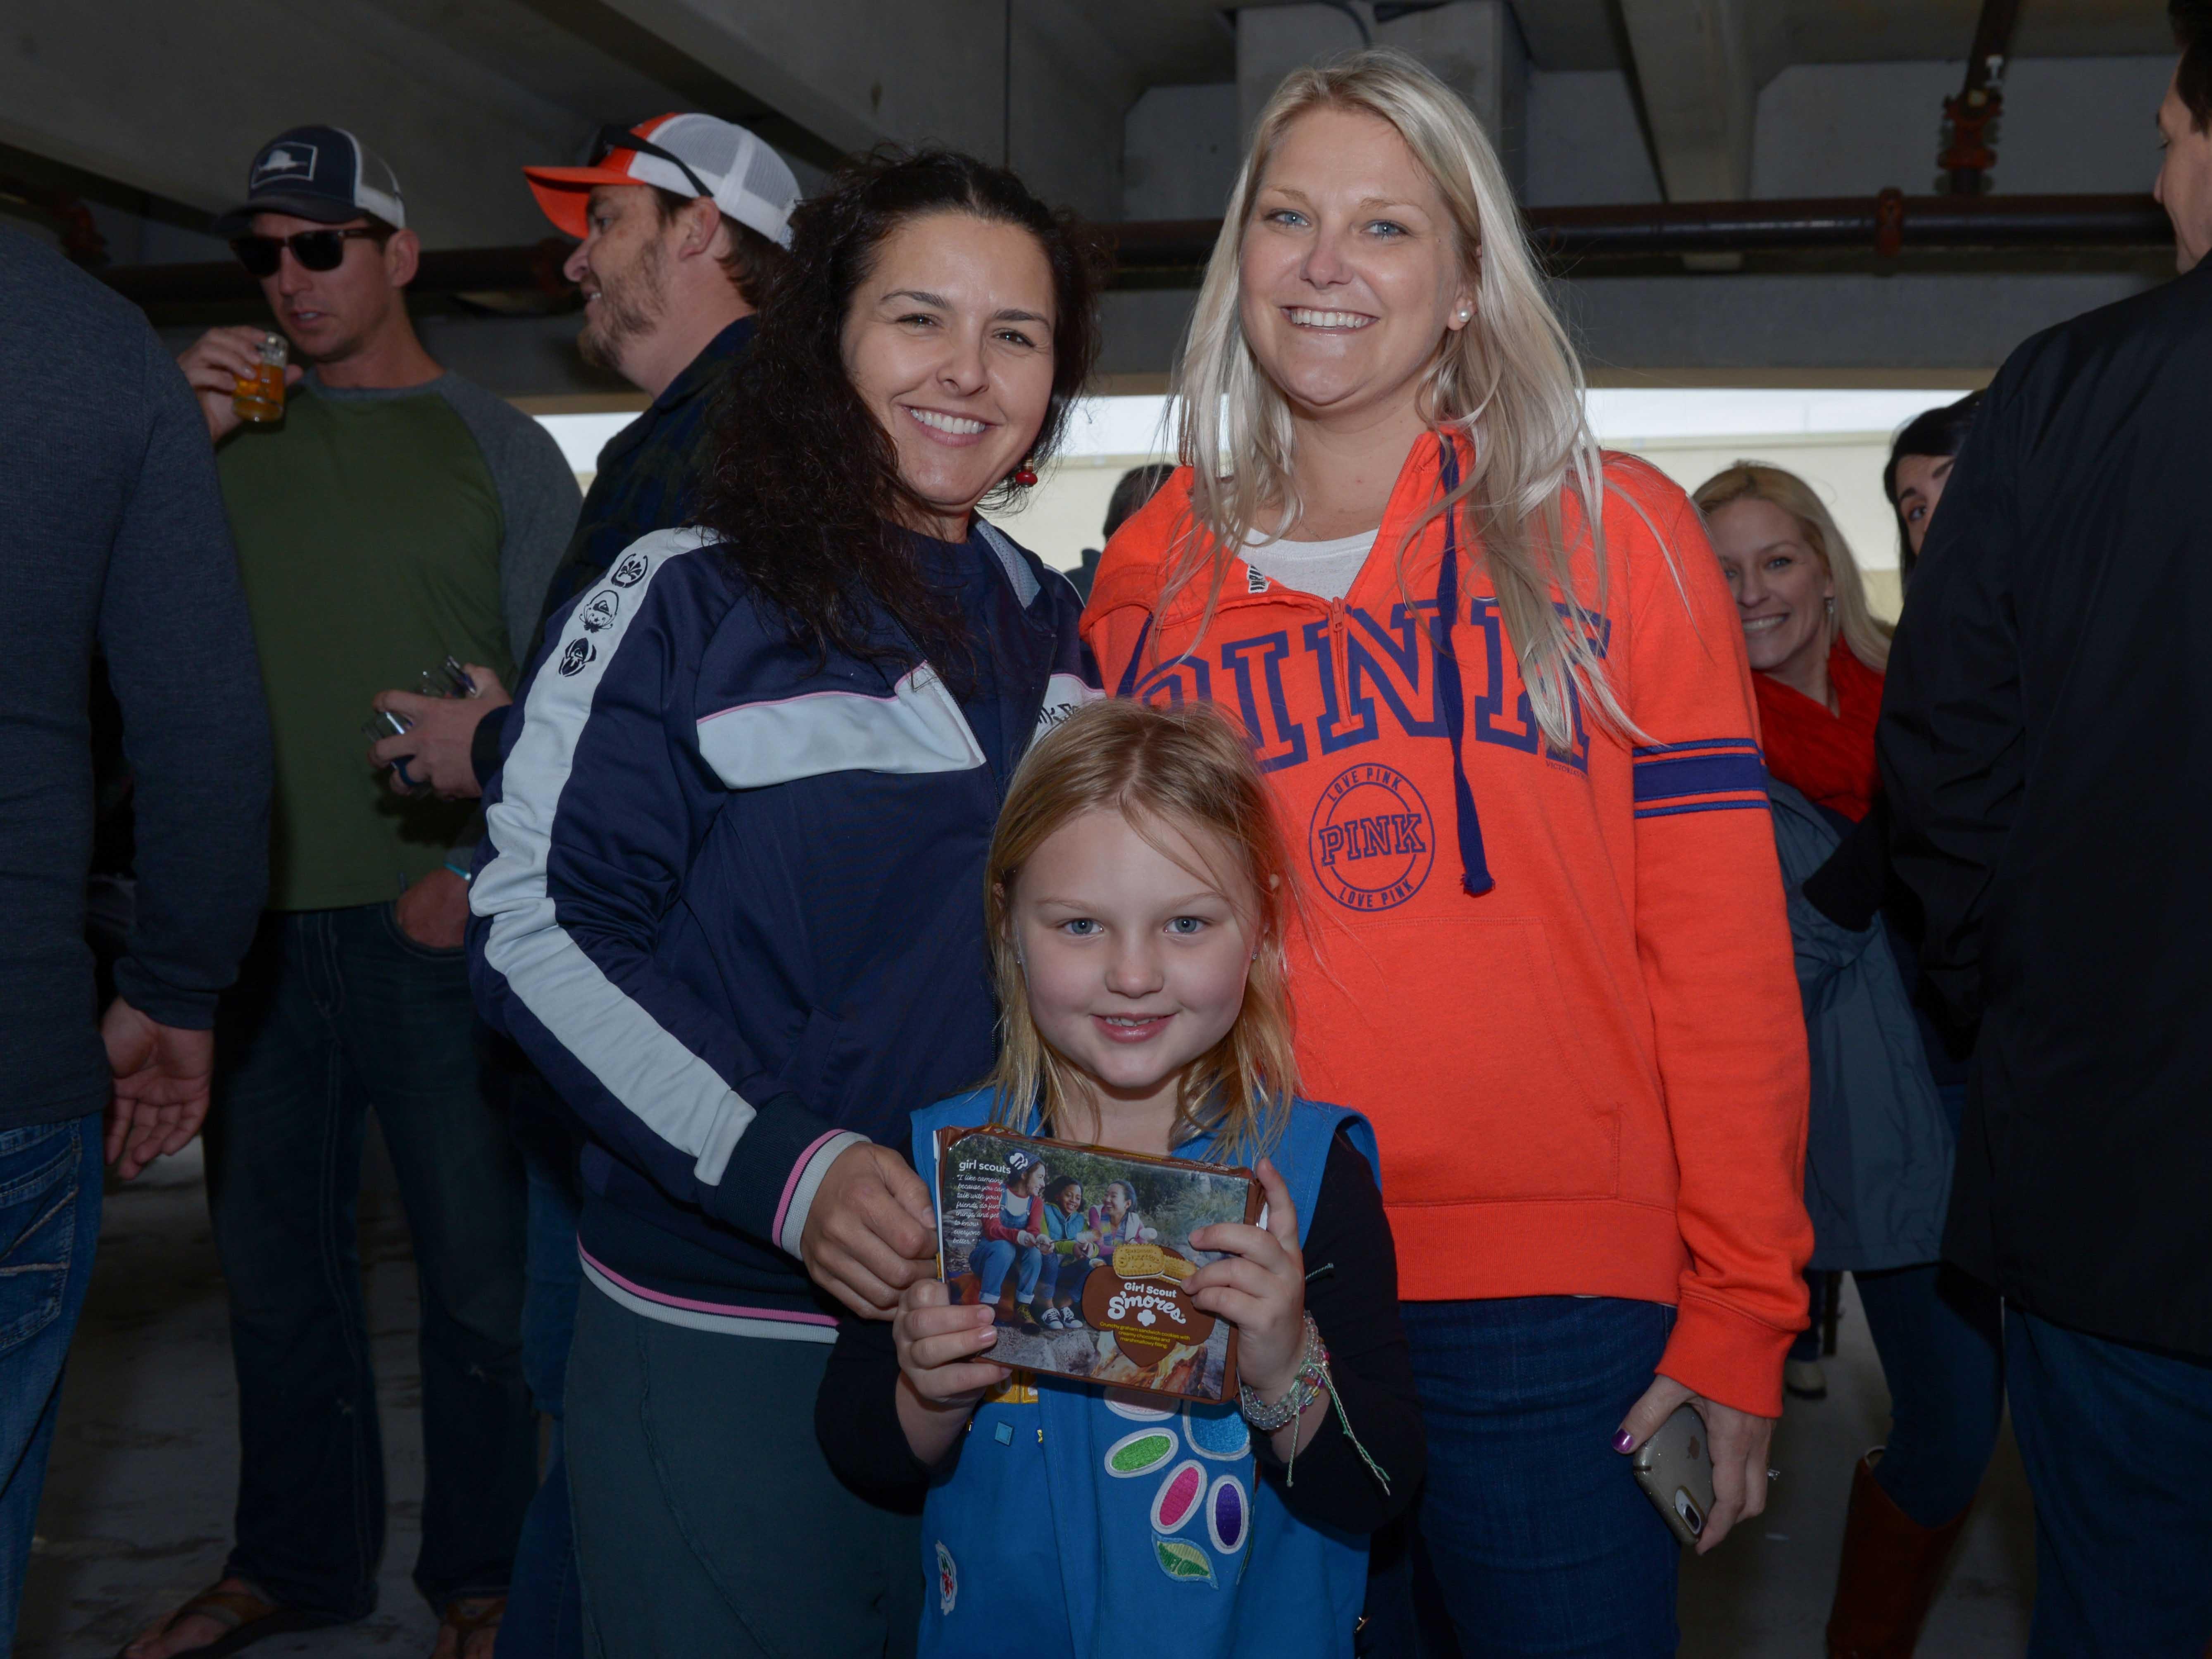 Krissy Gibbons, left, of Varsity Sports Shop, with Kate and Courtney Gibbons at Bluebird Educational Foundation's Groovin' & Tastin' Sunrise City Wine & Spirits Fest.